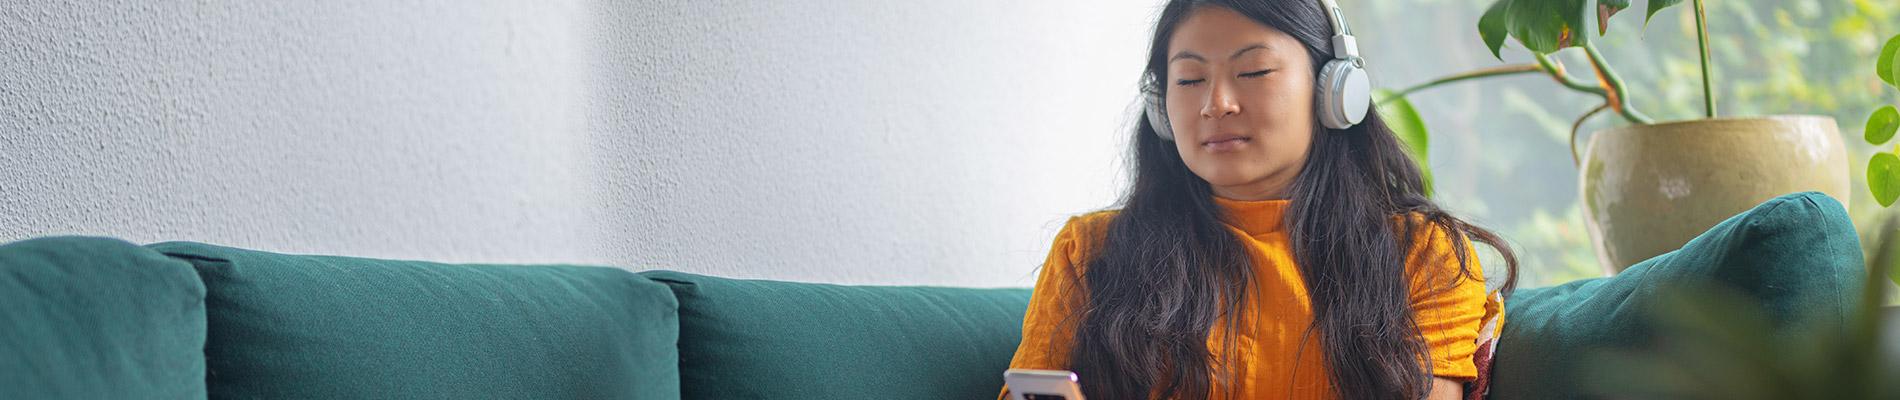 IZA collectief zorgverzekering mindfulness